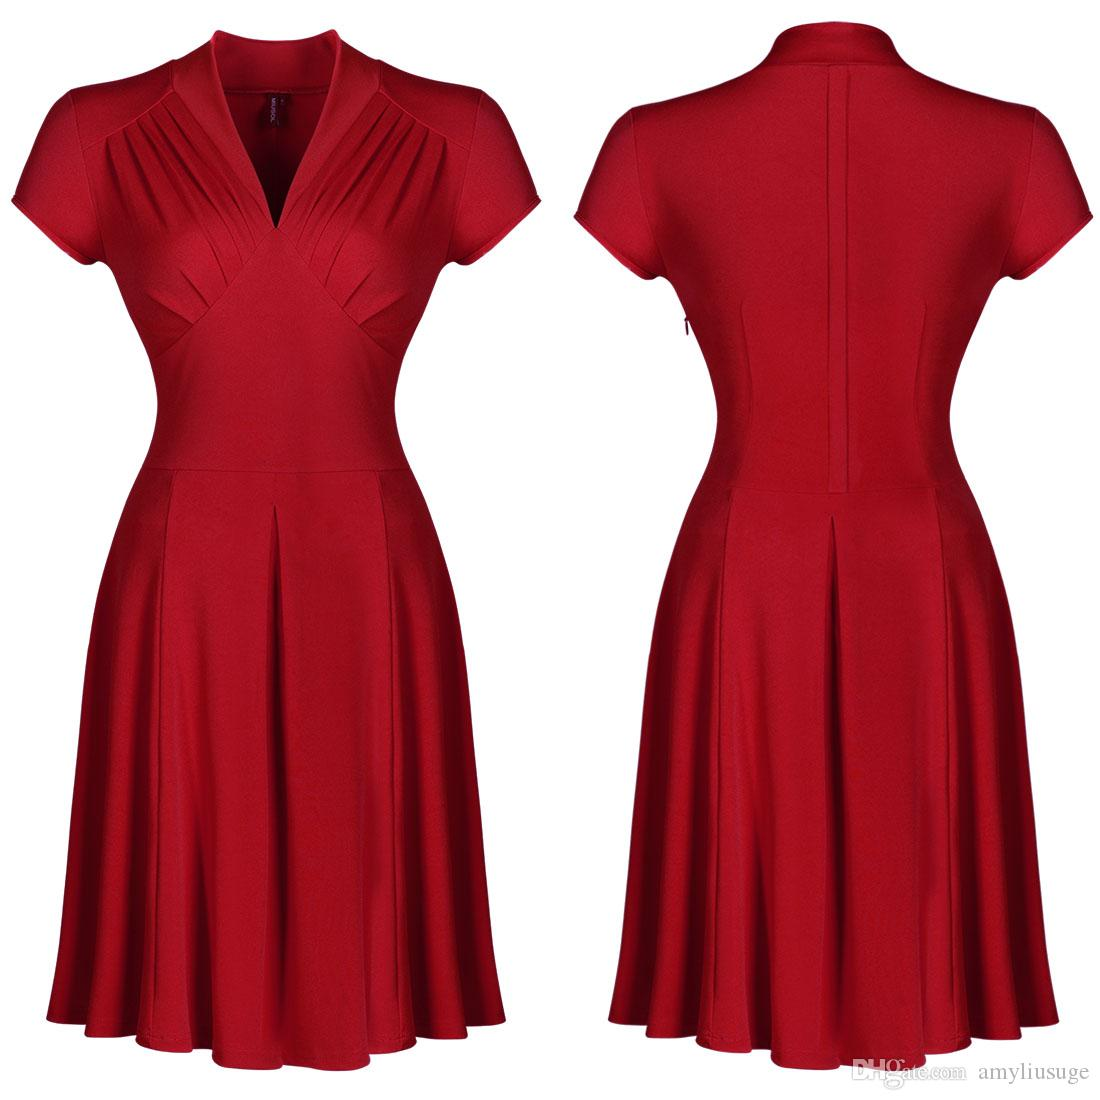 Women's Vintage Style Retro 1940s Shirtwaist Flared Evening Tea Dress Swing Skaters Ball Gown 3188